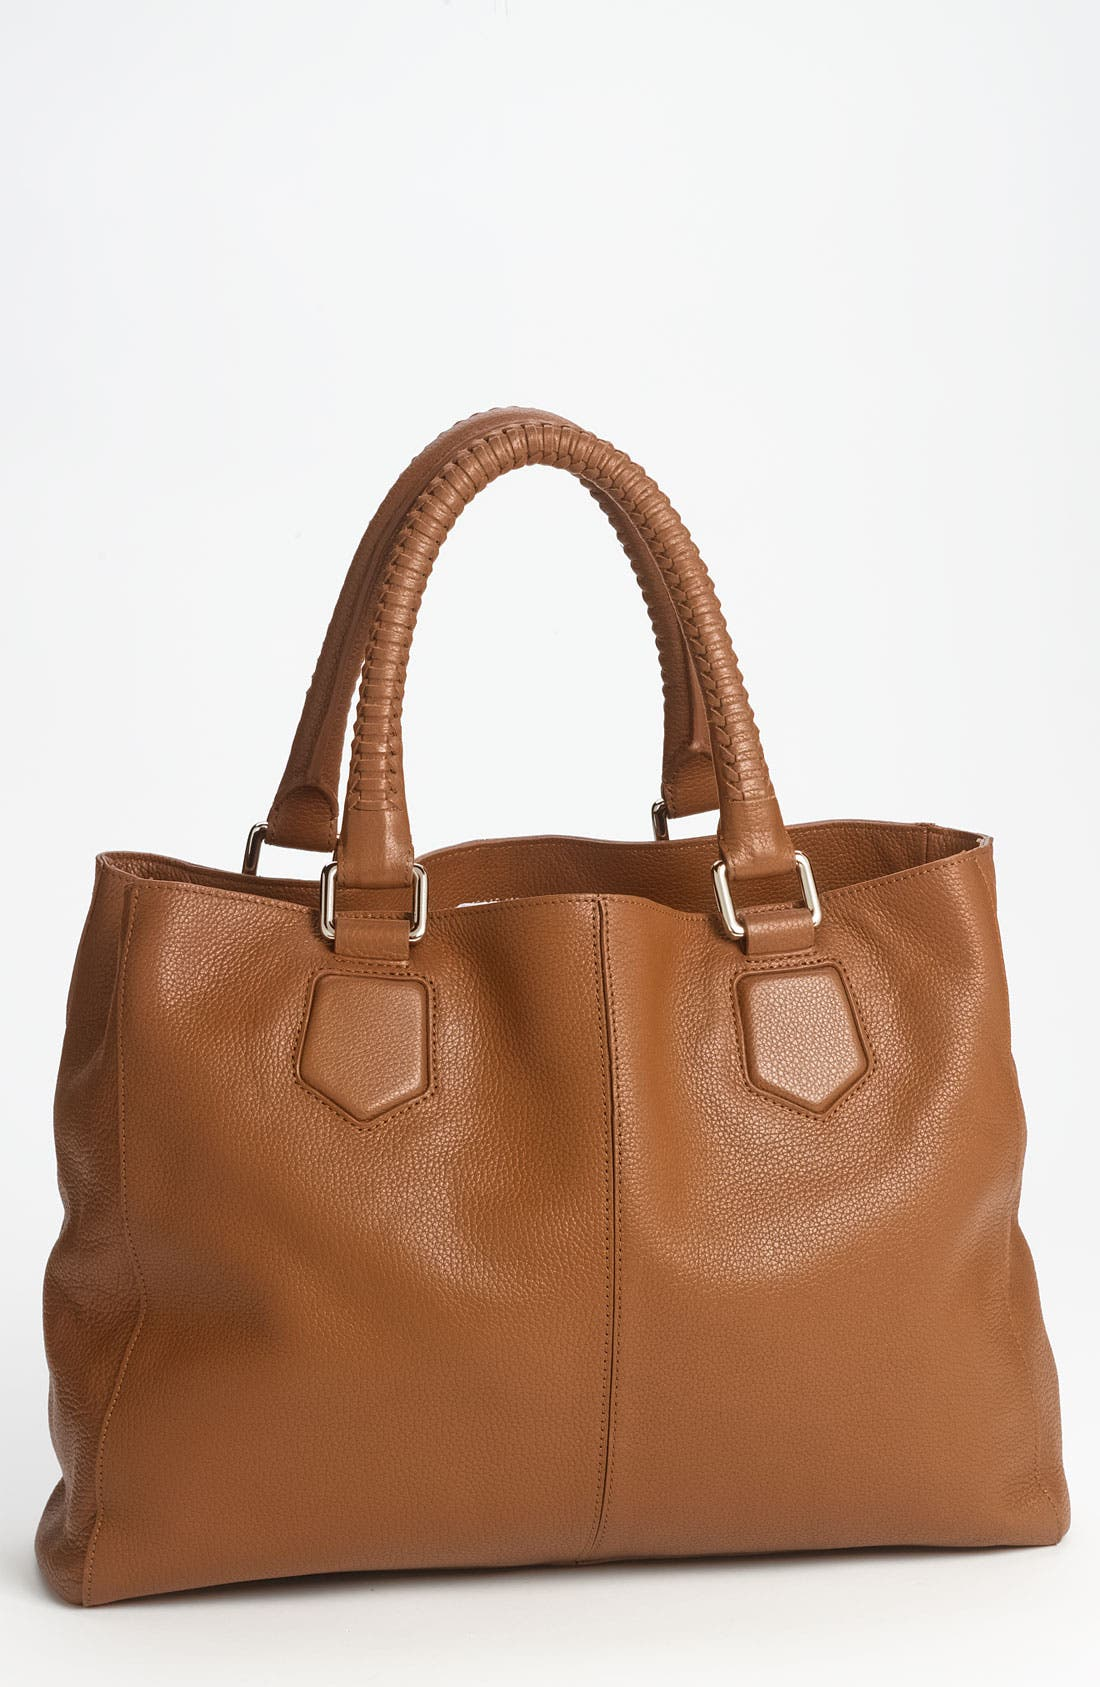 'Mila' Leather Shoulder Bag,                             Main thumbnail 1, color,                             212